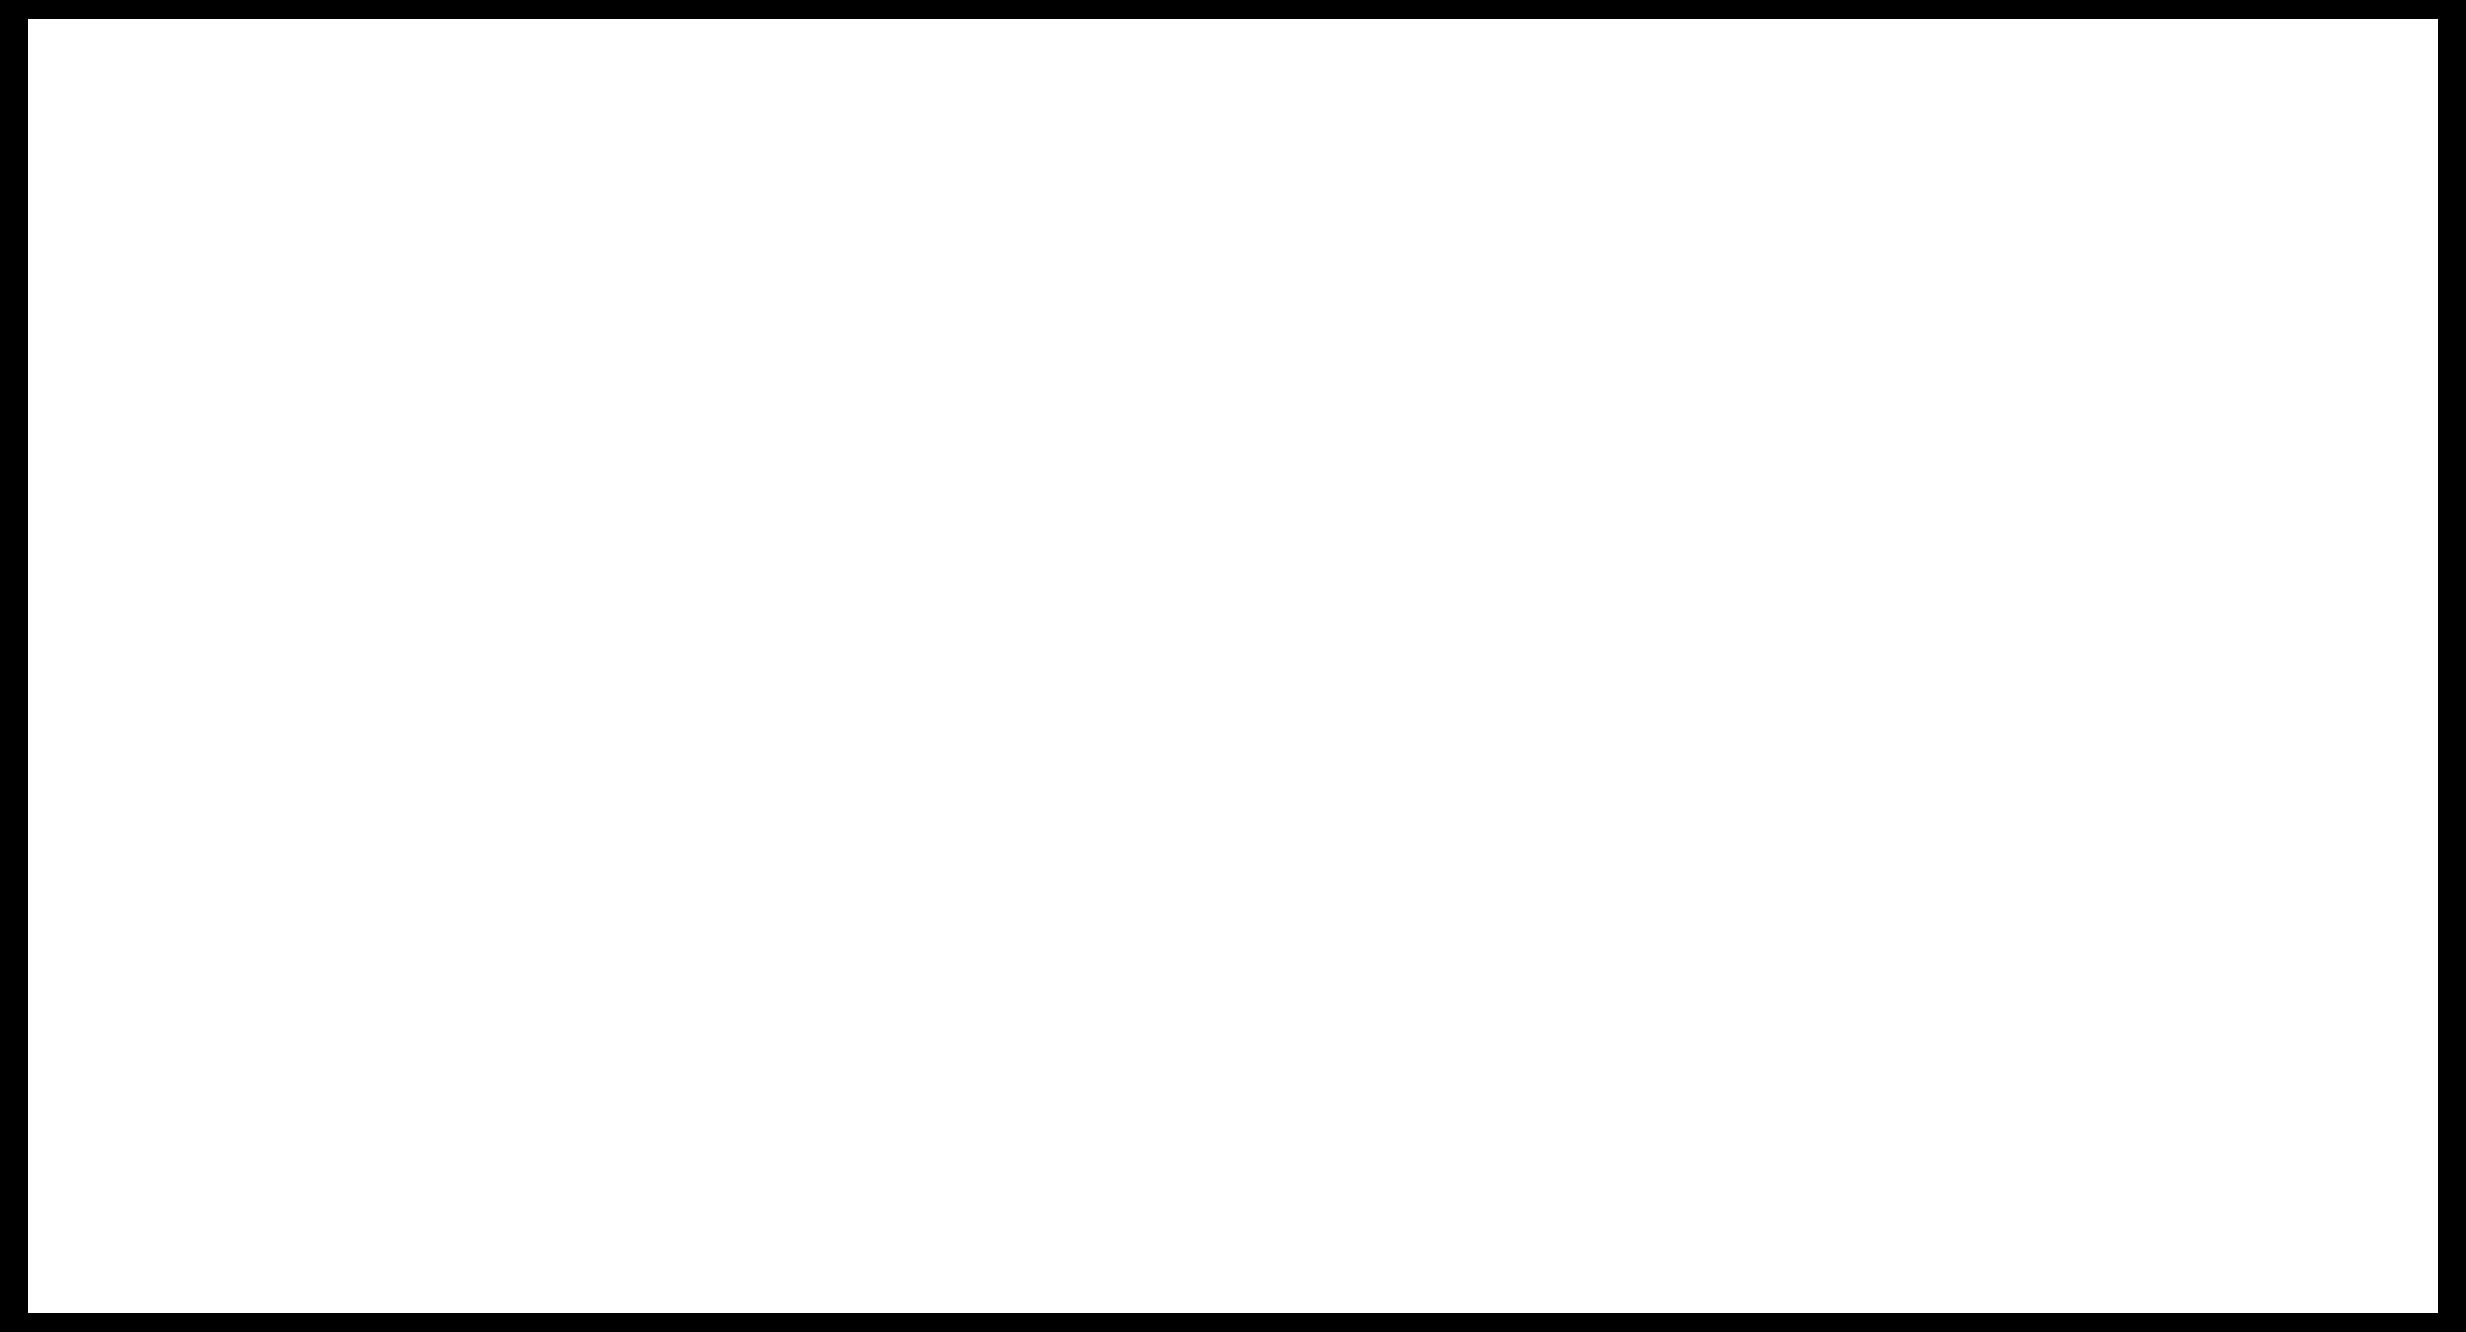 SKY Informática Ltda